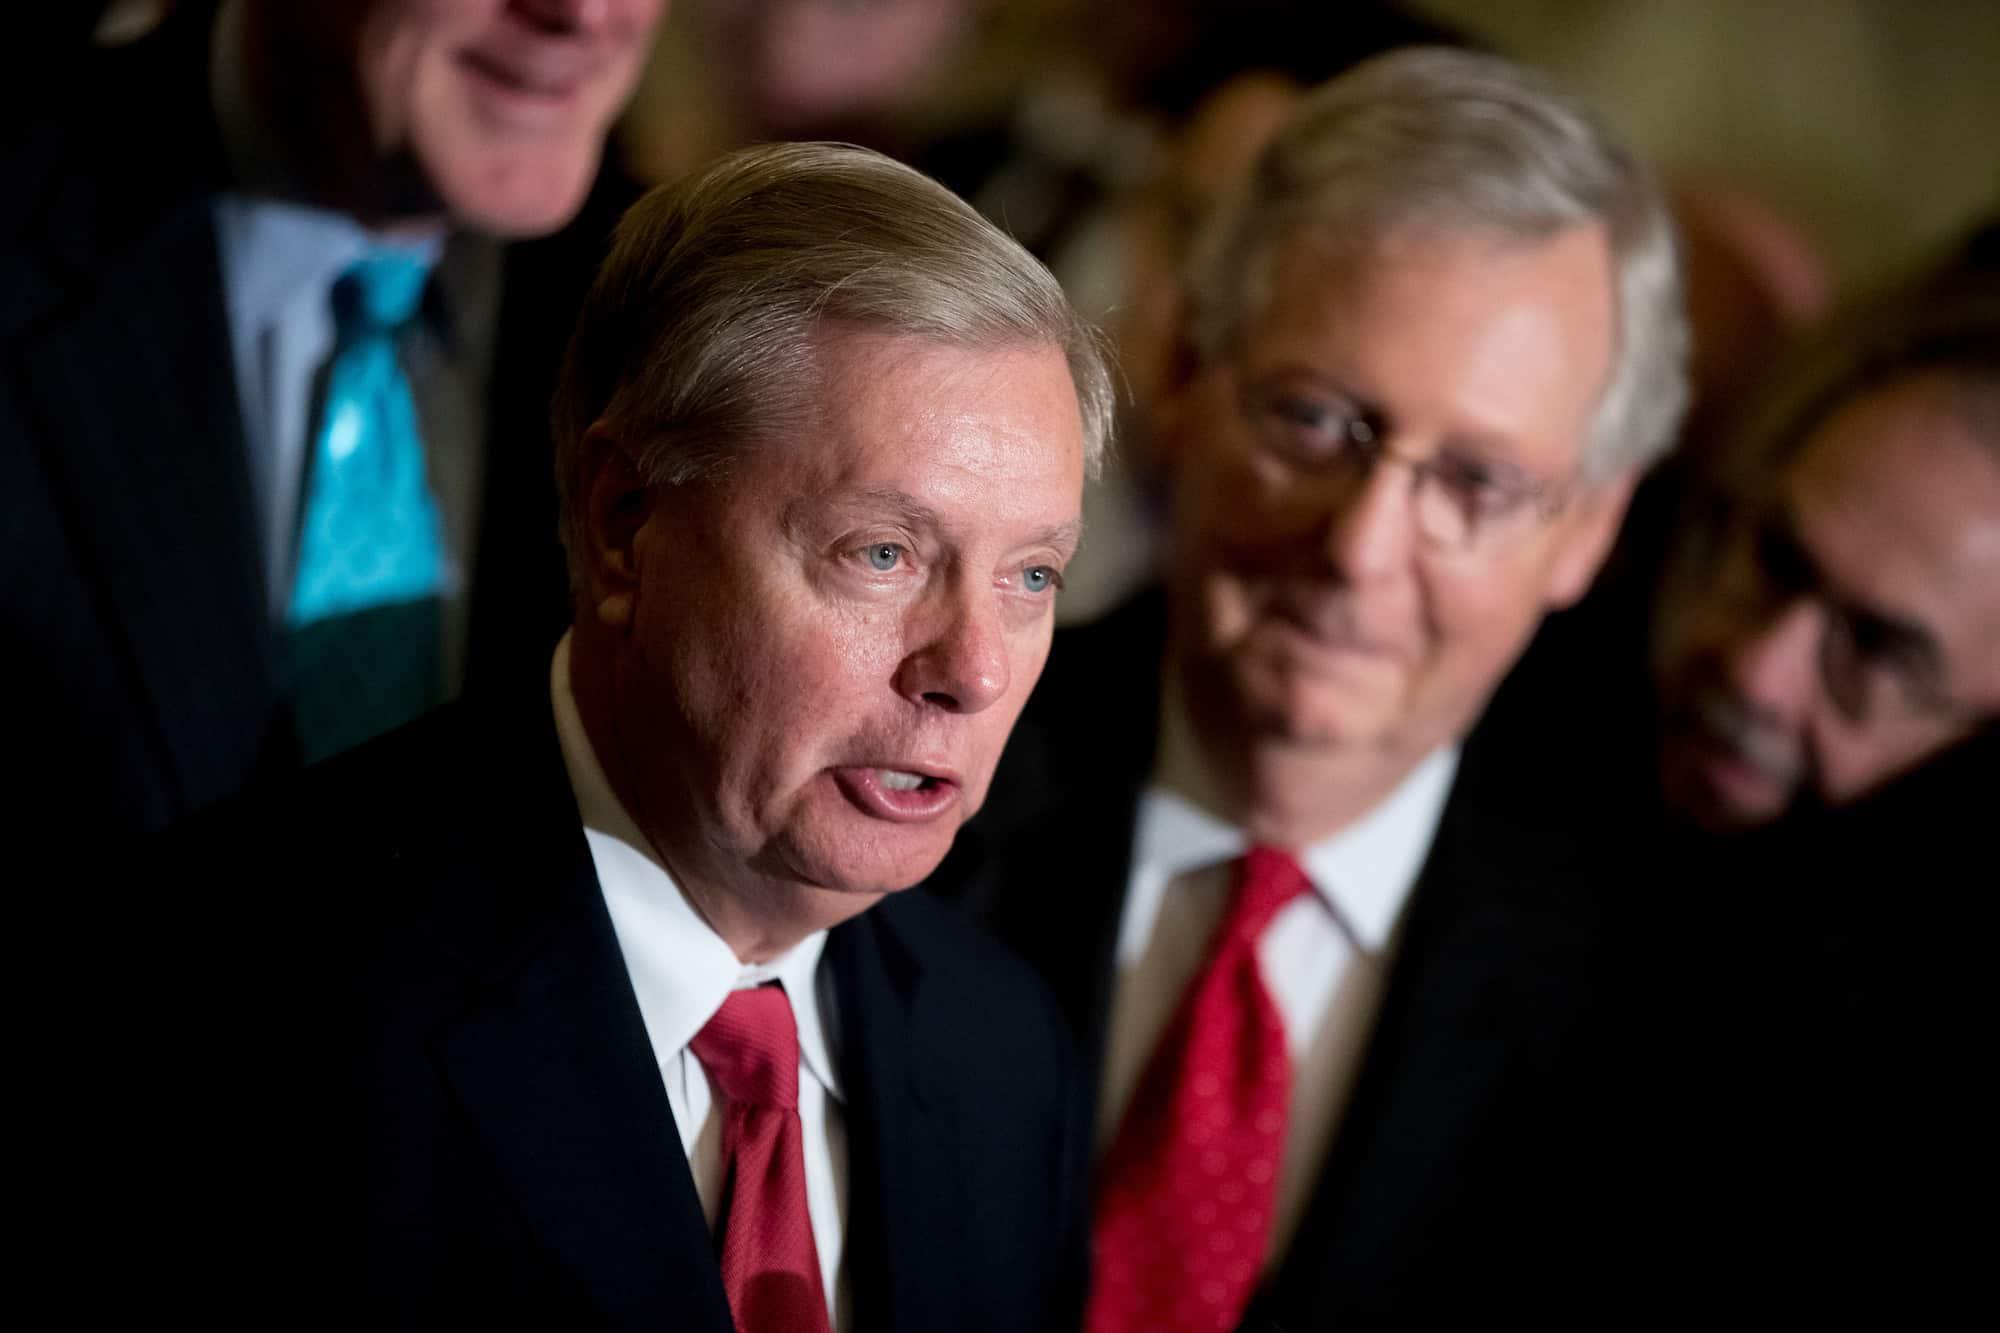 Artist Sends Senate Majority Leader Mitch McConnell Turtle Food